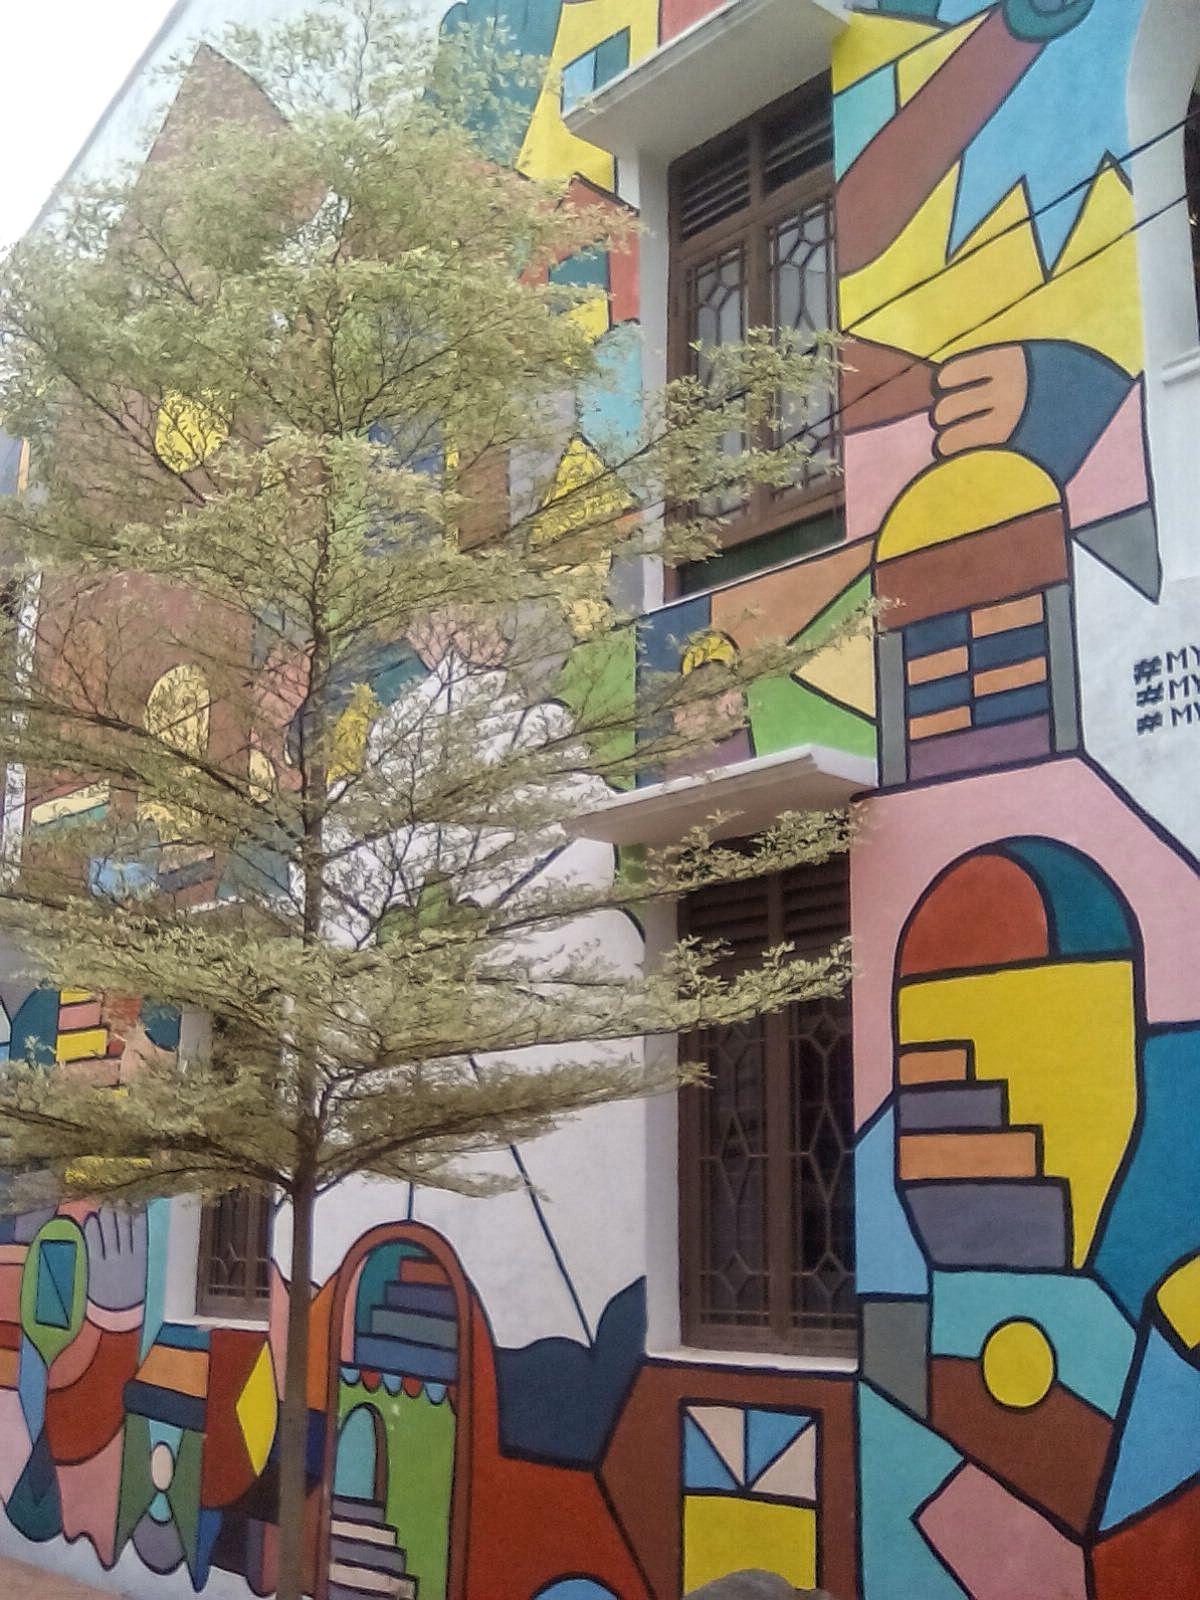 maison street art melaka malaisie vie nomade voyage